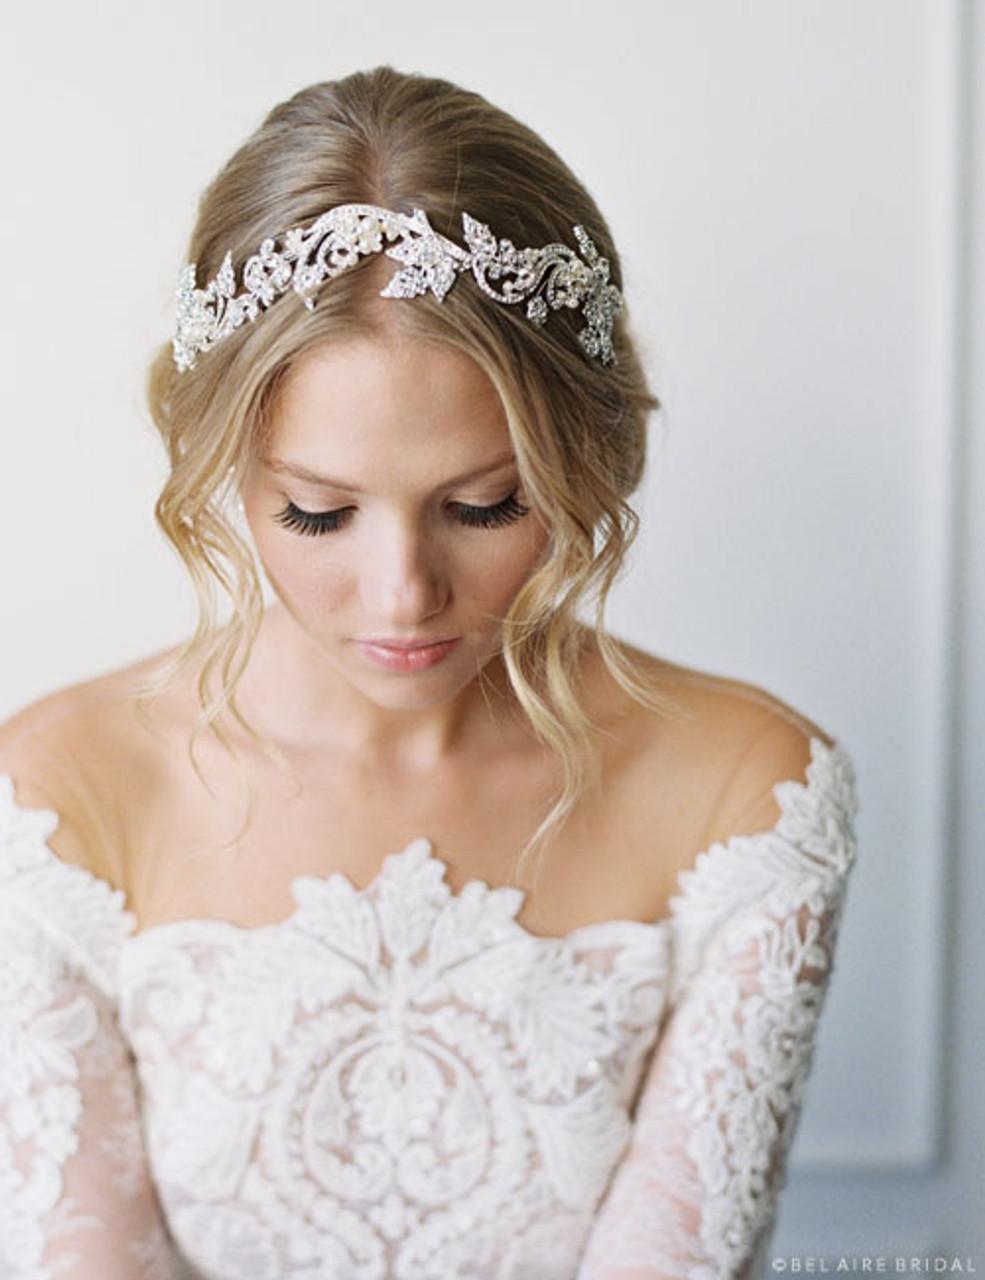 Weddings Brushed Silver Swirl Hairpiece Rhinestone Bridal Hairpiece Rhinestone Hair Accessories